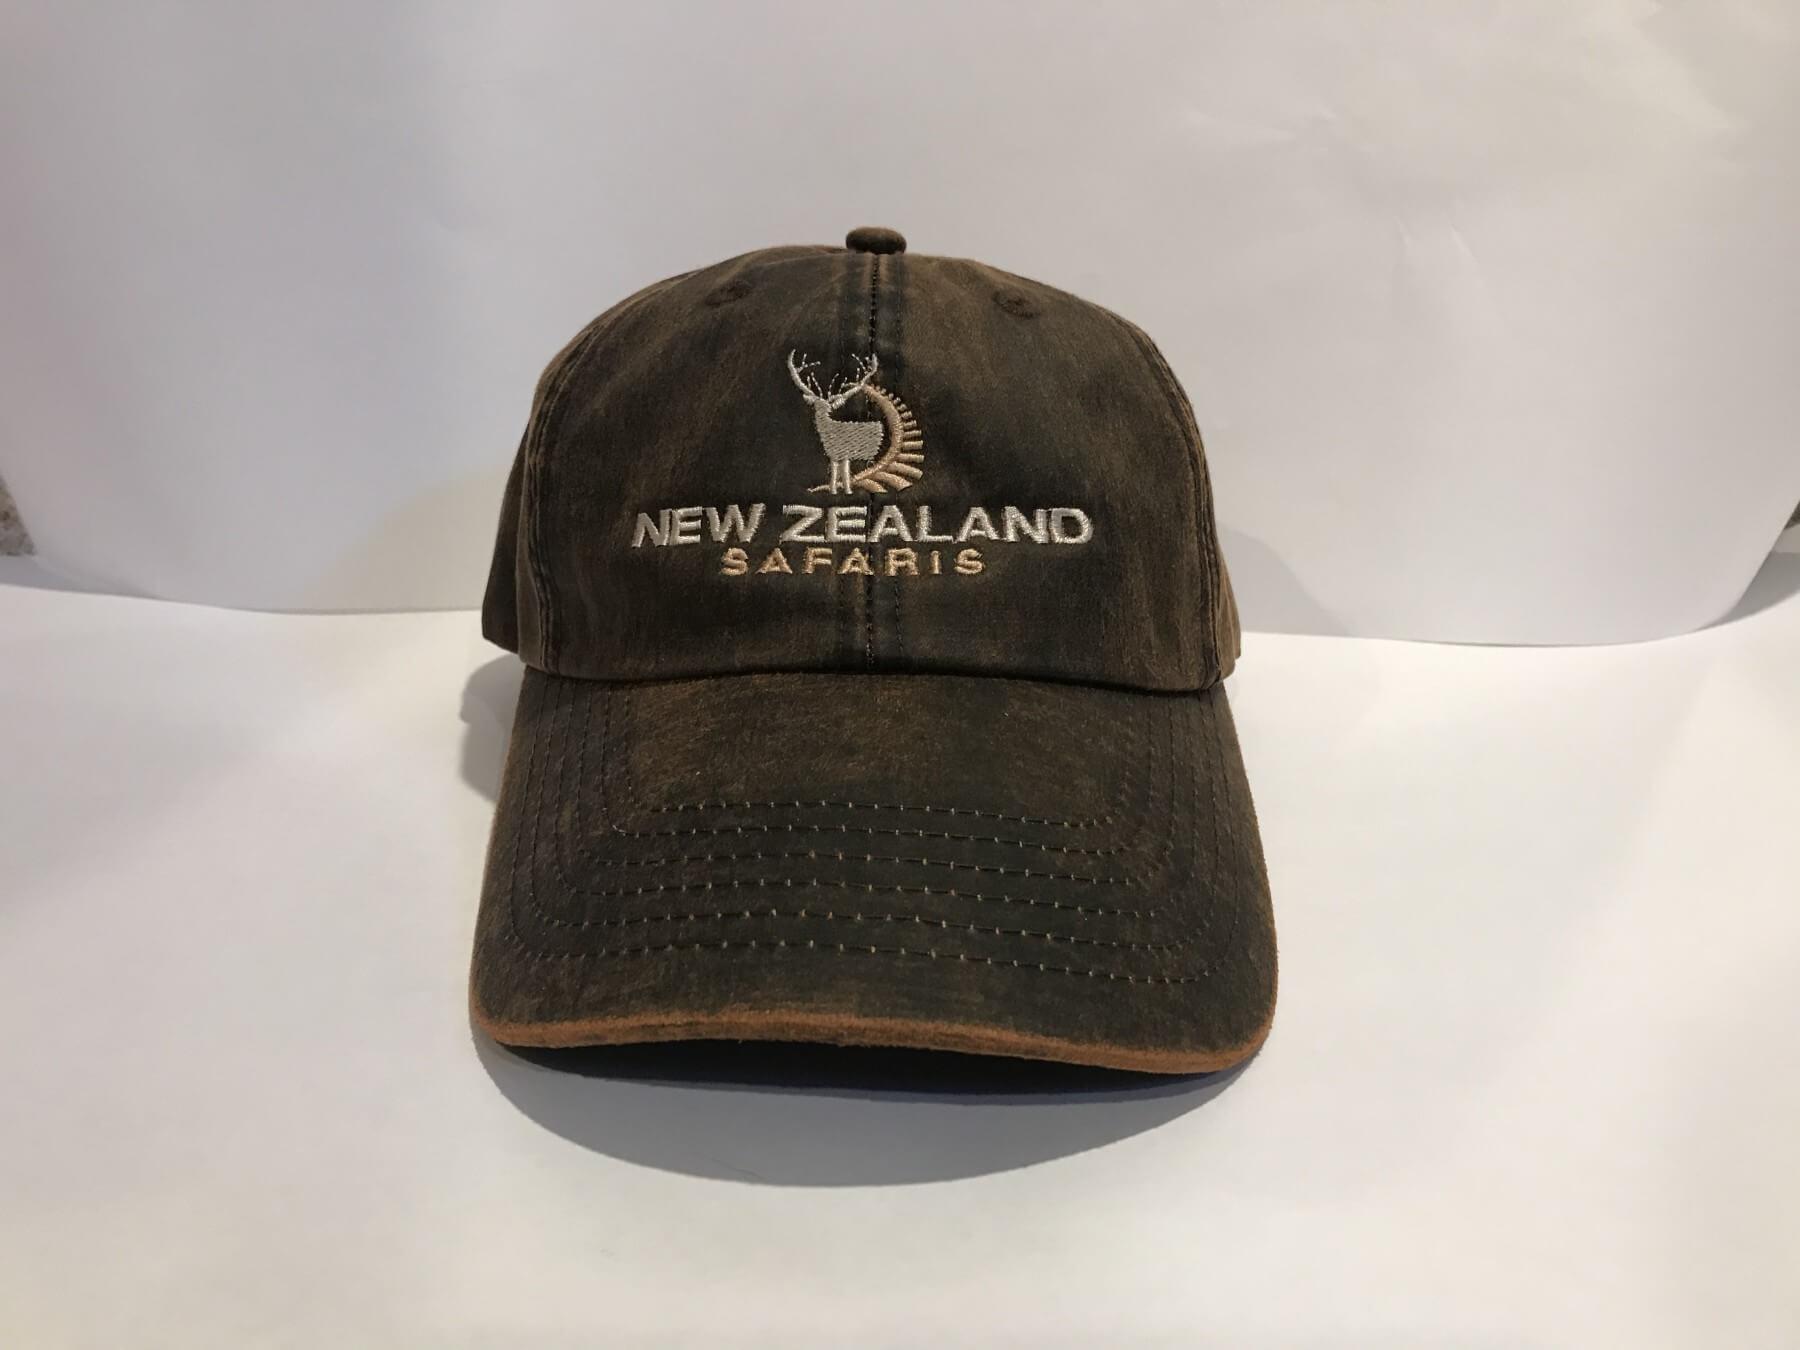 901b1d6c760 New zealand safaris cap jpg 1800x1350 New zealand hat